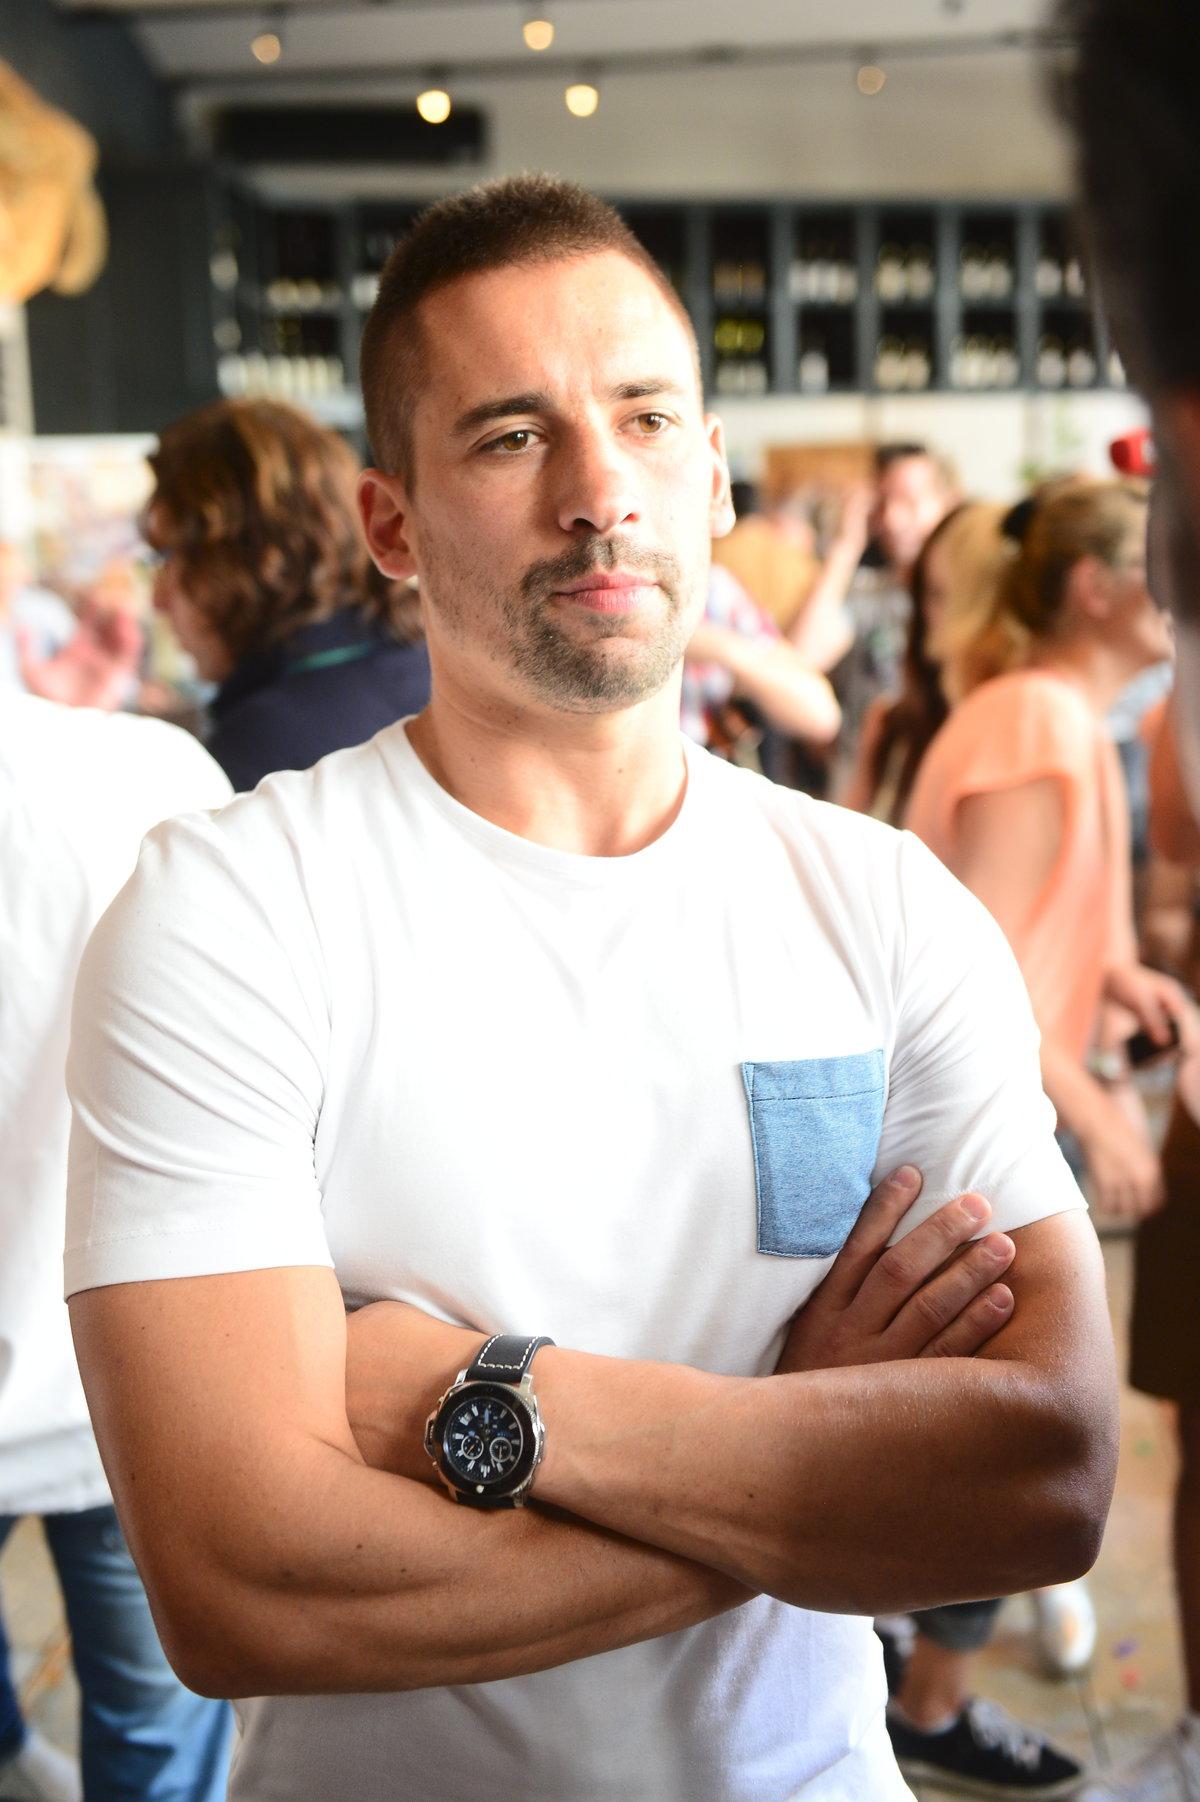 Hokejista Tomáš Plekanec